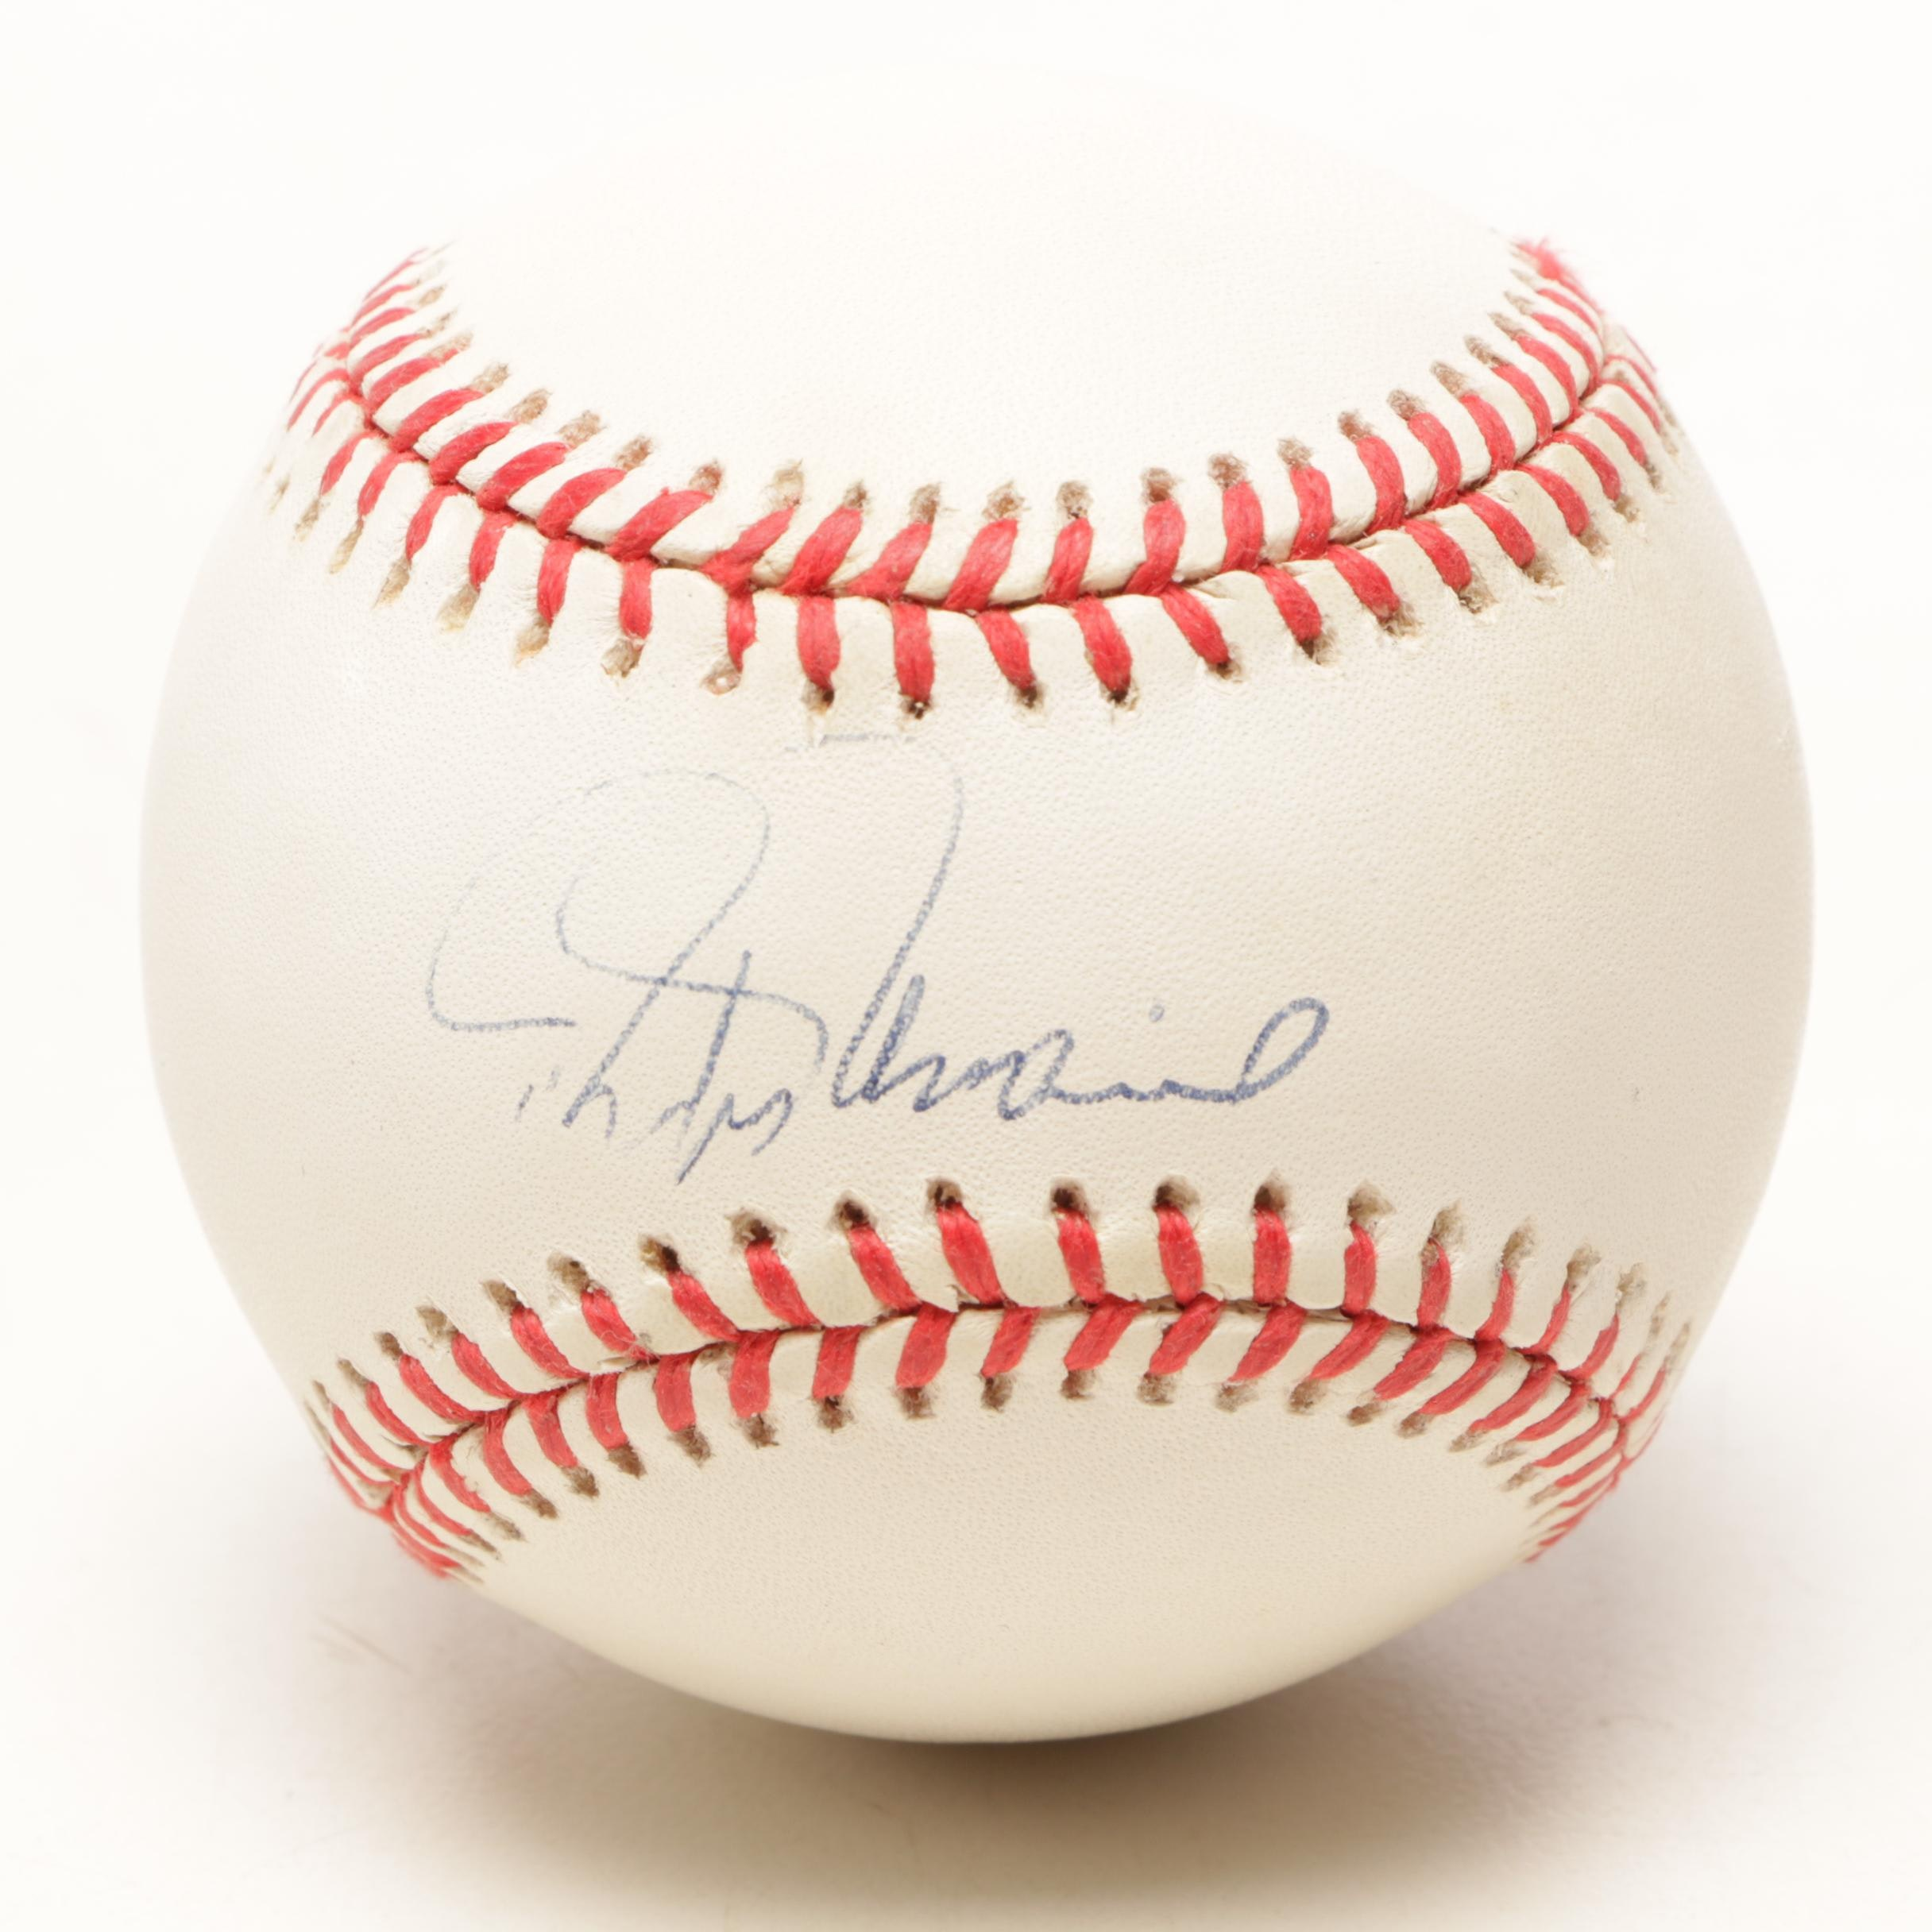 Rafael Palmero Signed Rawlings American League Baseball